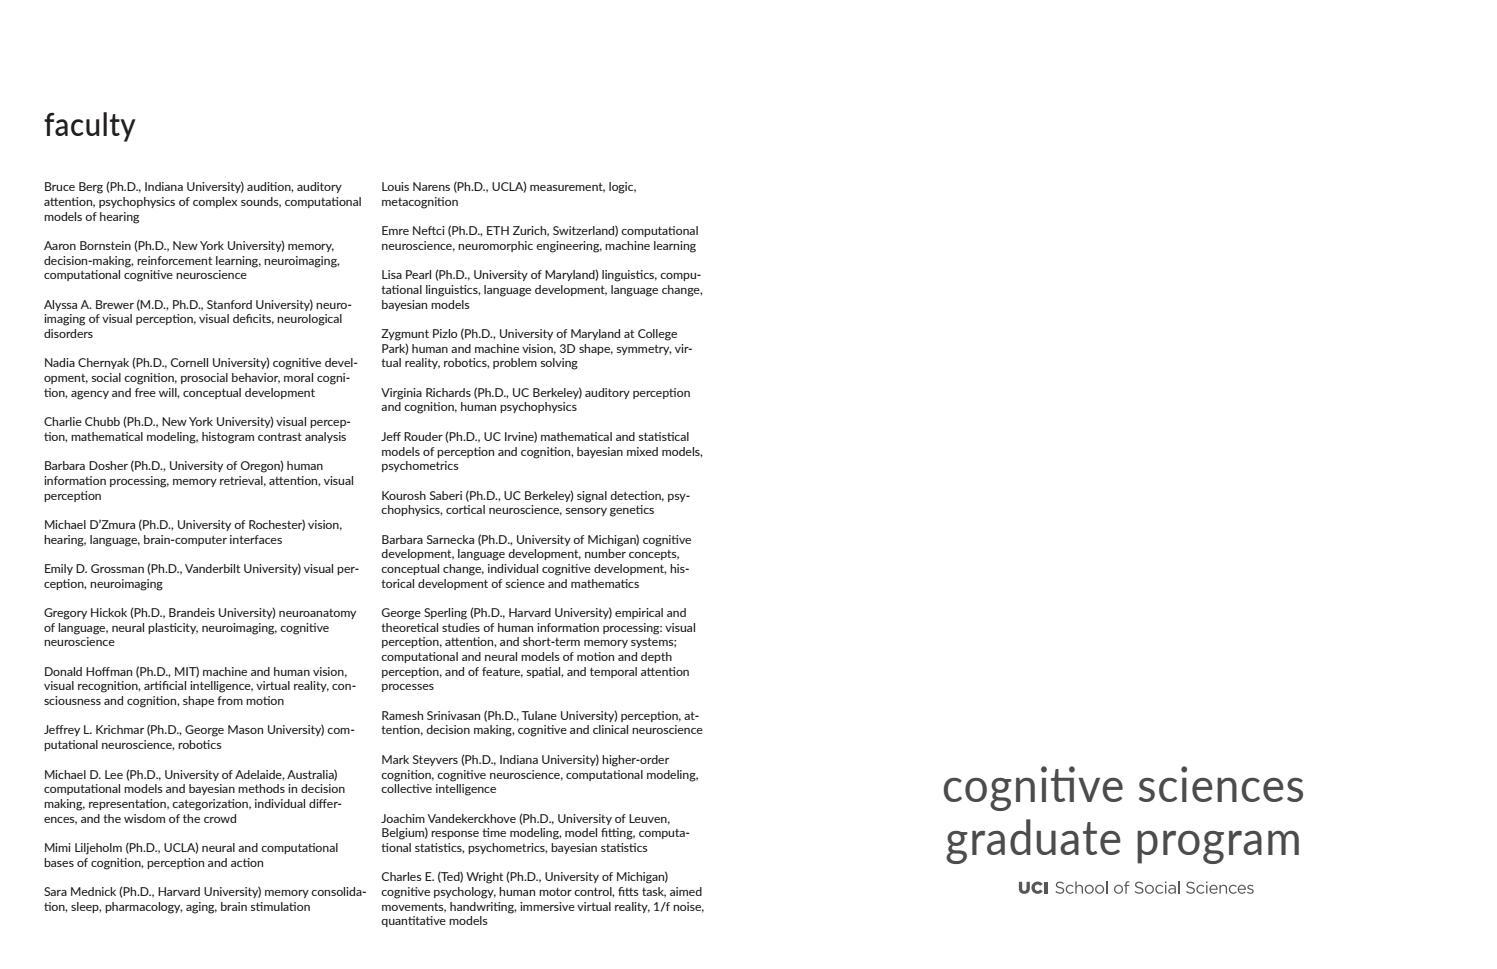 Cognitive Sciences Graduate Program 2018 by UCI School of